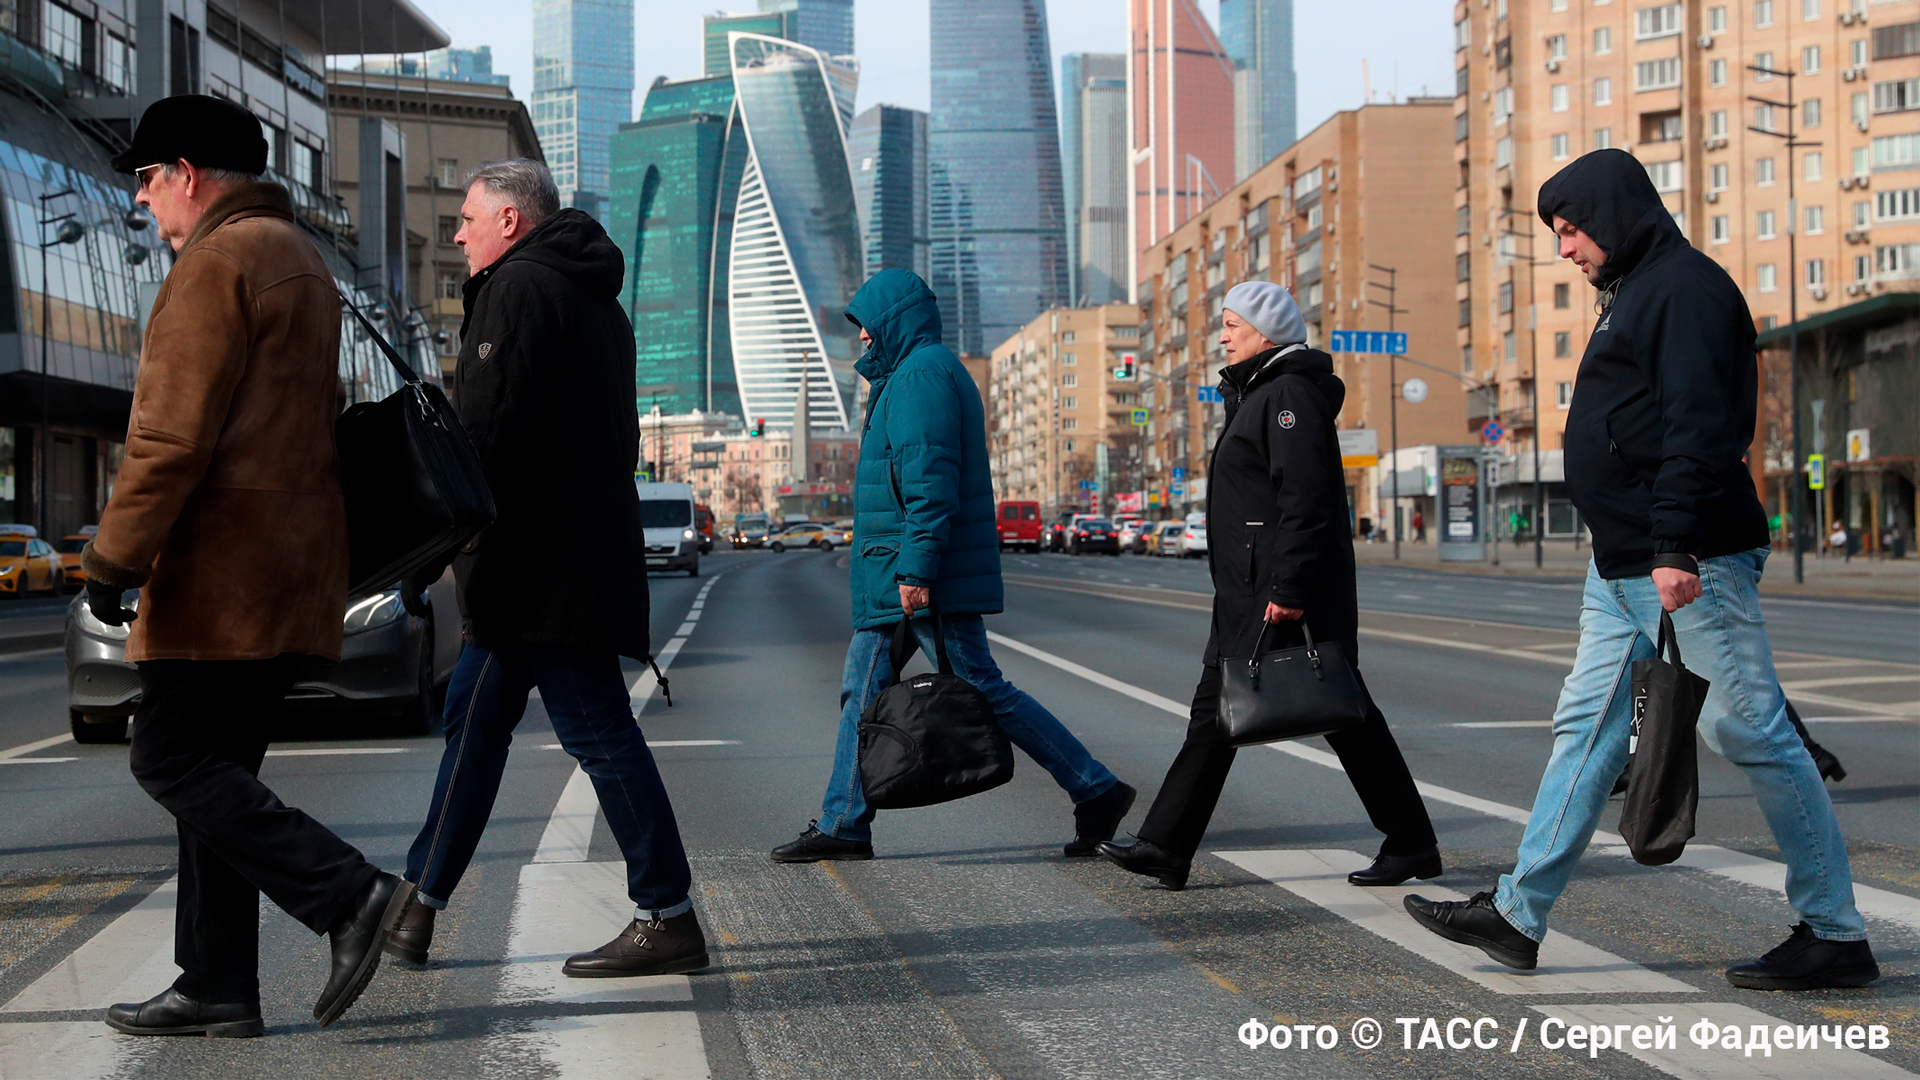 <p>Фото © ТАСС /Сергей Фадеичев</p>